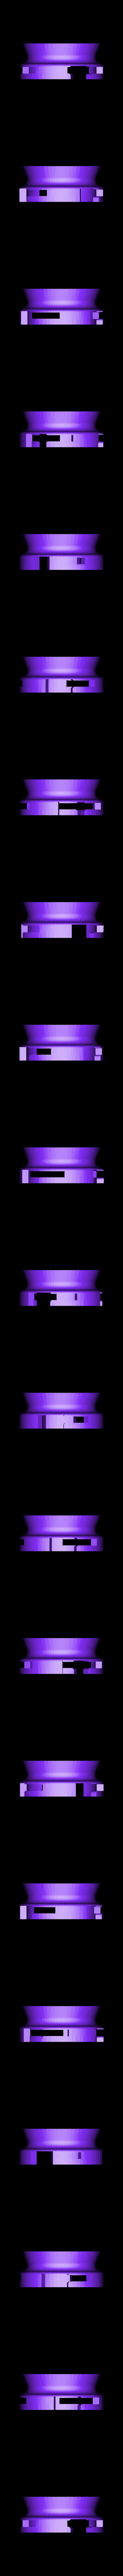 Cafév4.STL Download STL file Entonnoir percolateur delonghi • 3D printing template, chino52